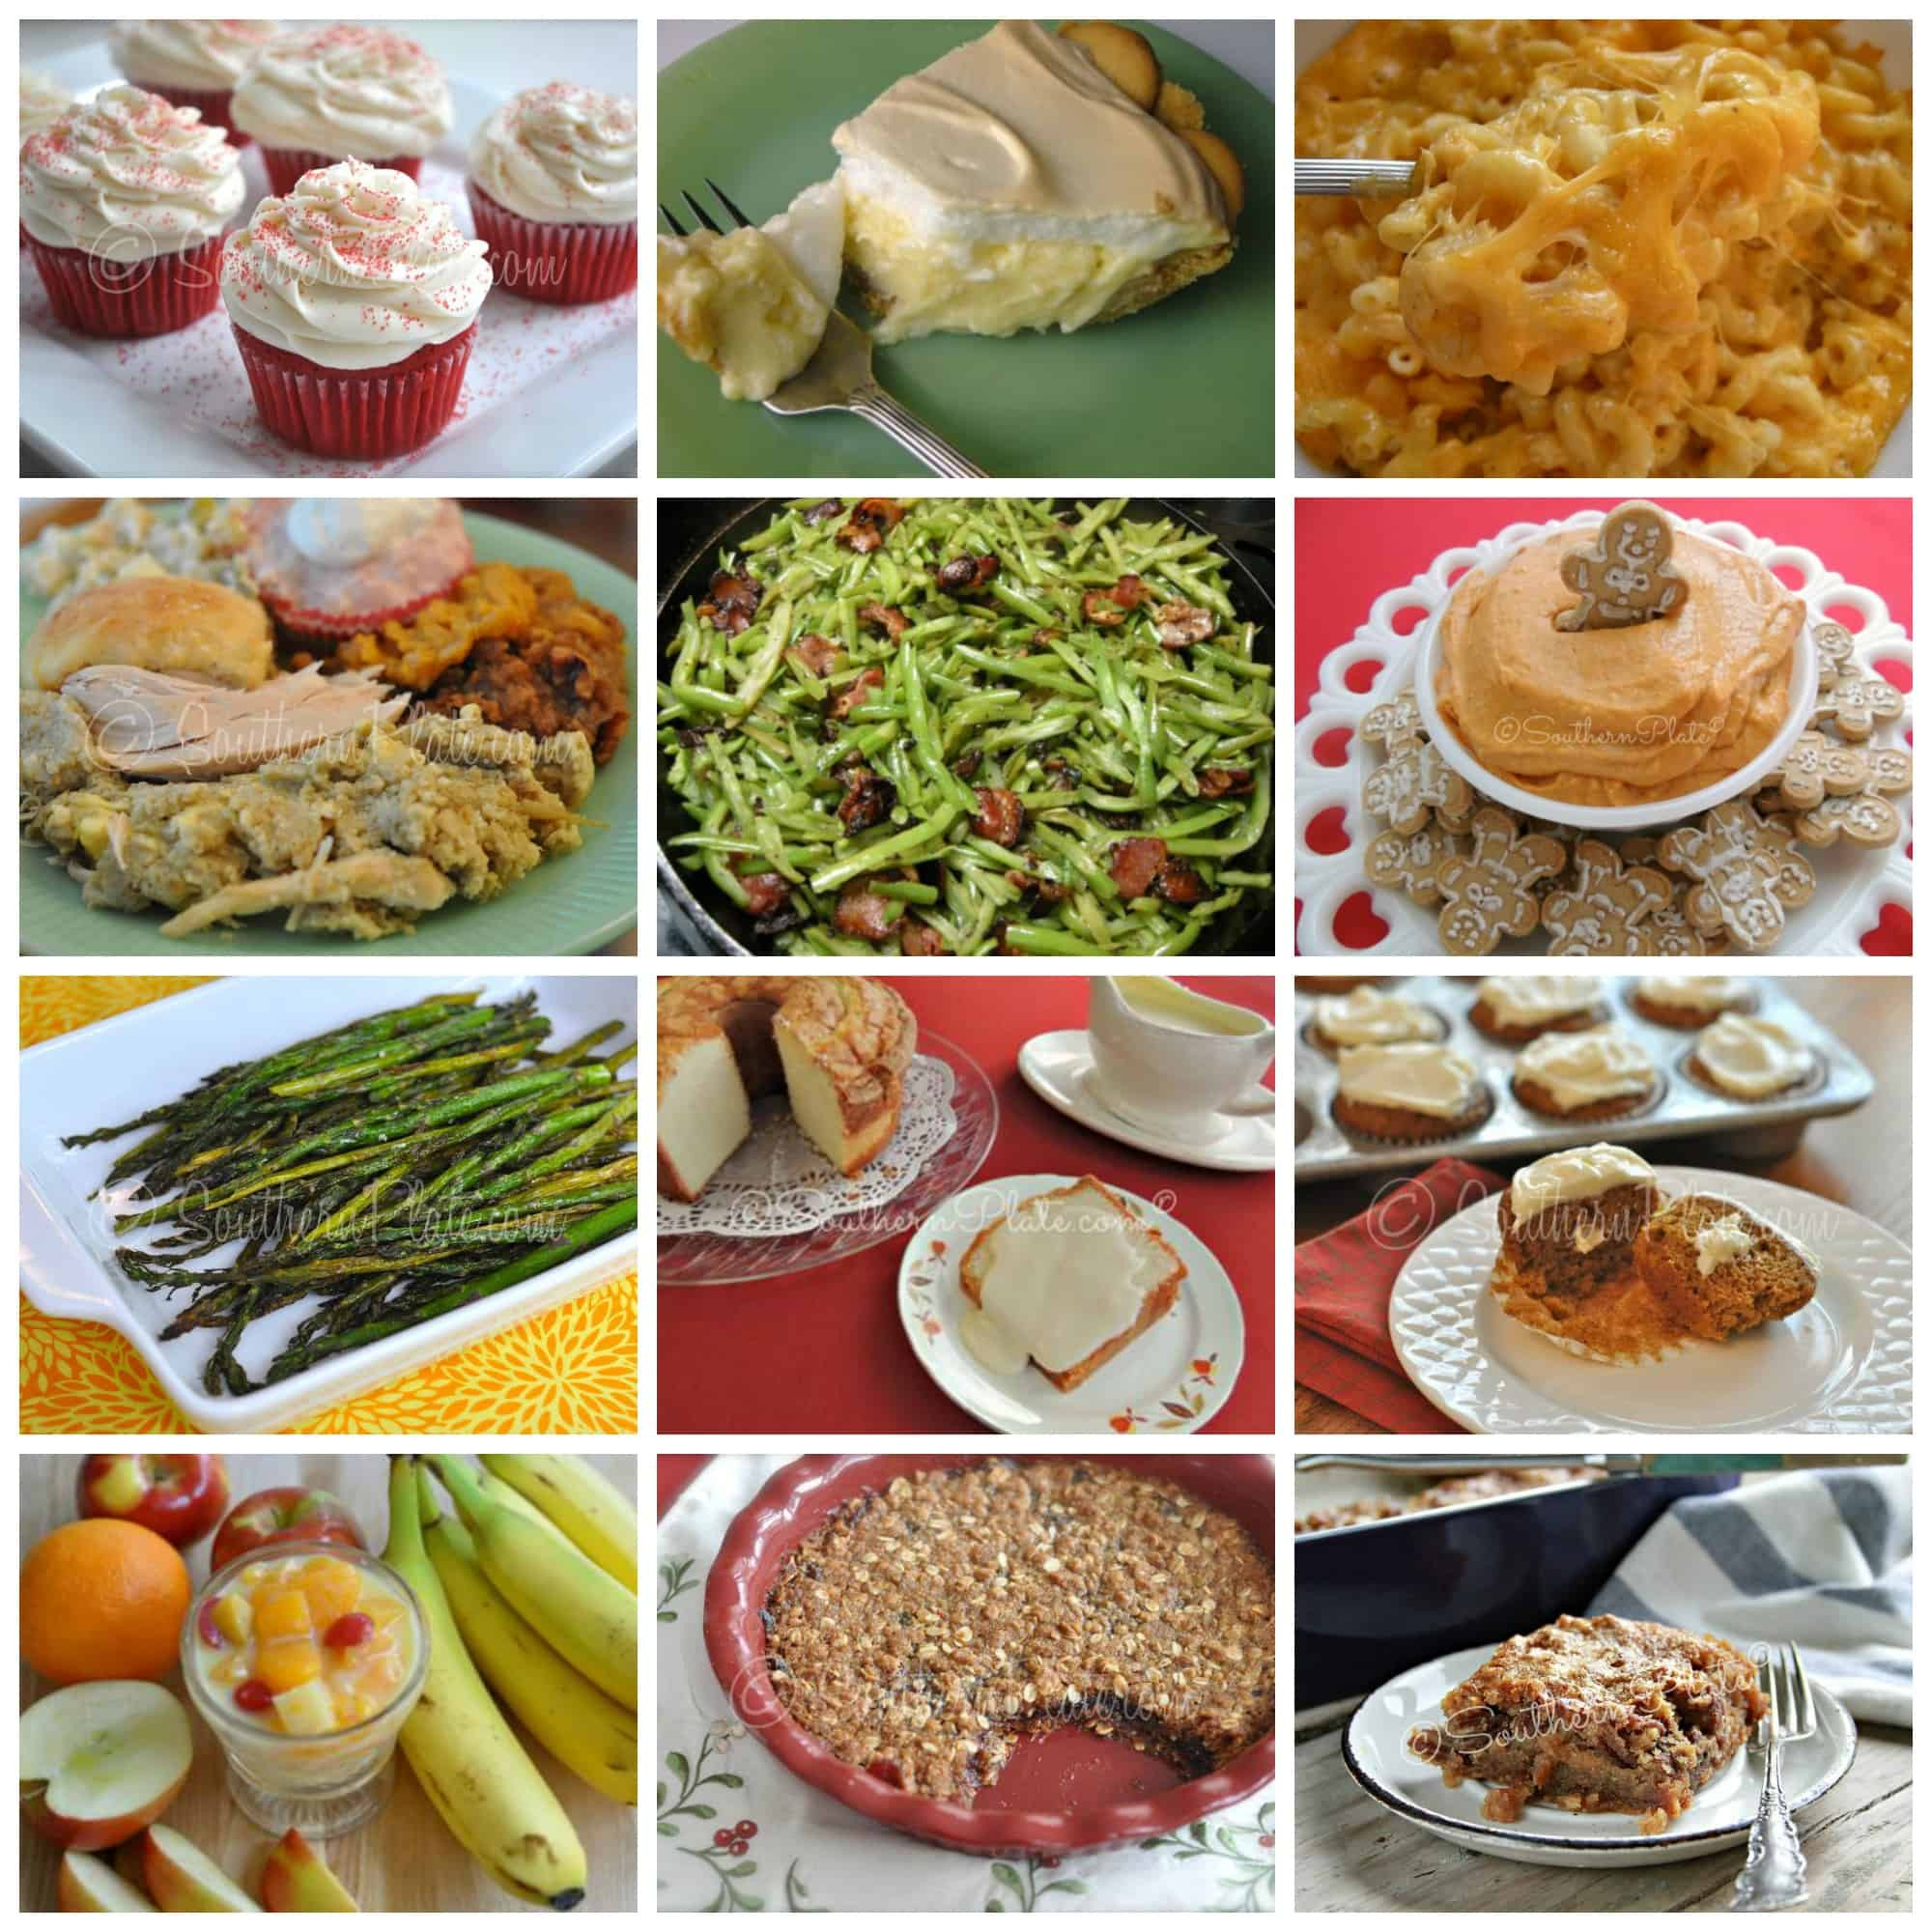 Southern Christmas Dinner Menu Ideas  Holiday Menu Bonanza with time saving tips 70 RECIPES